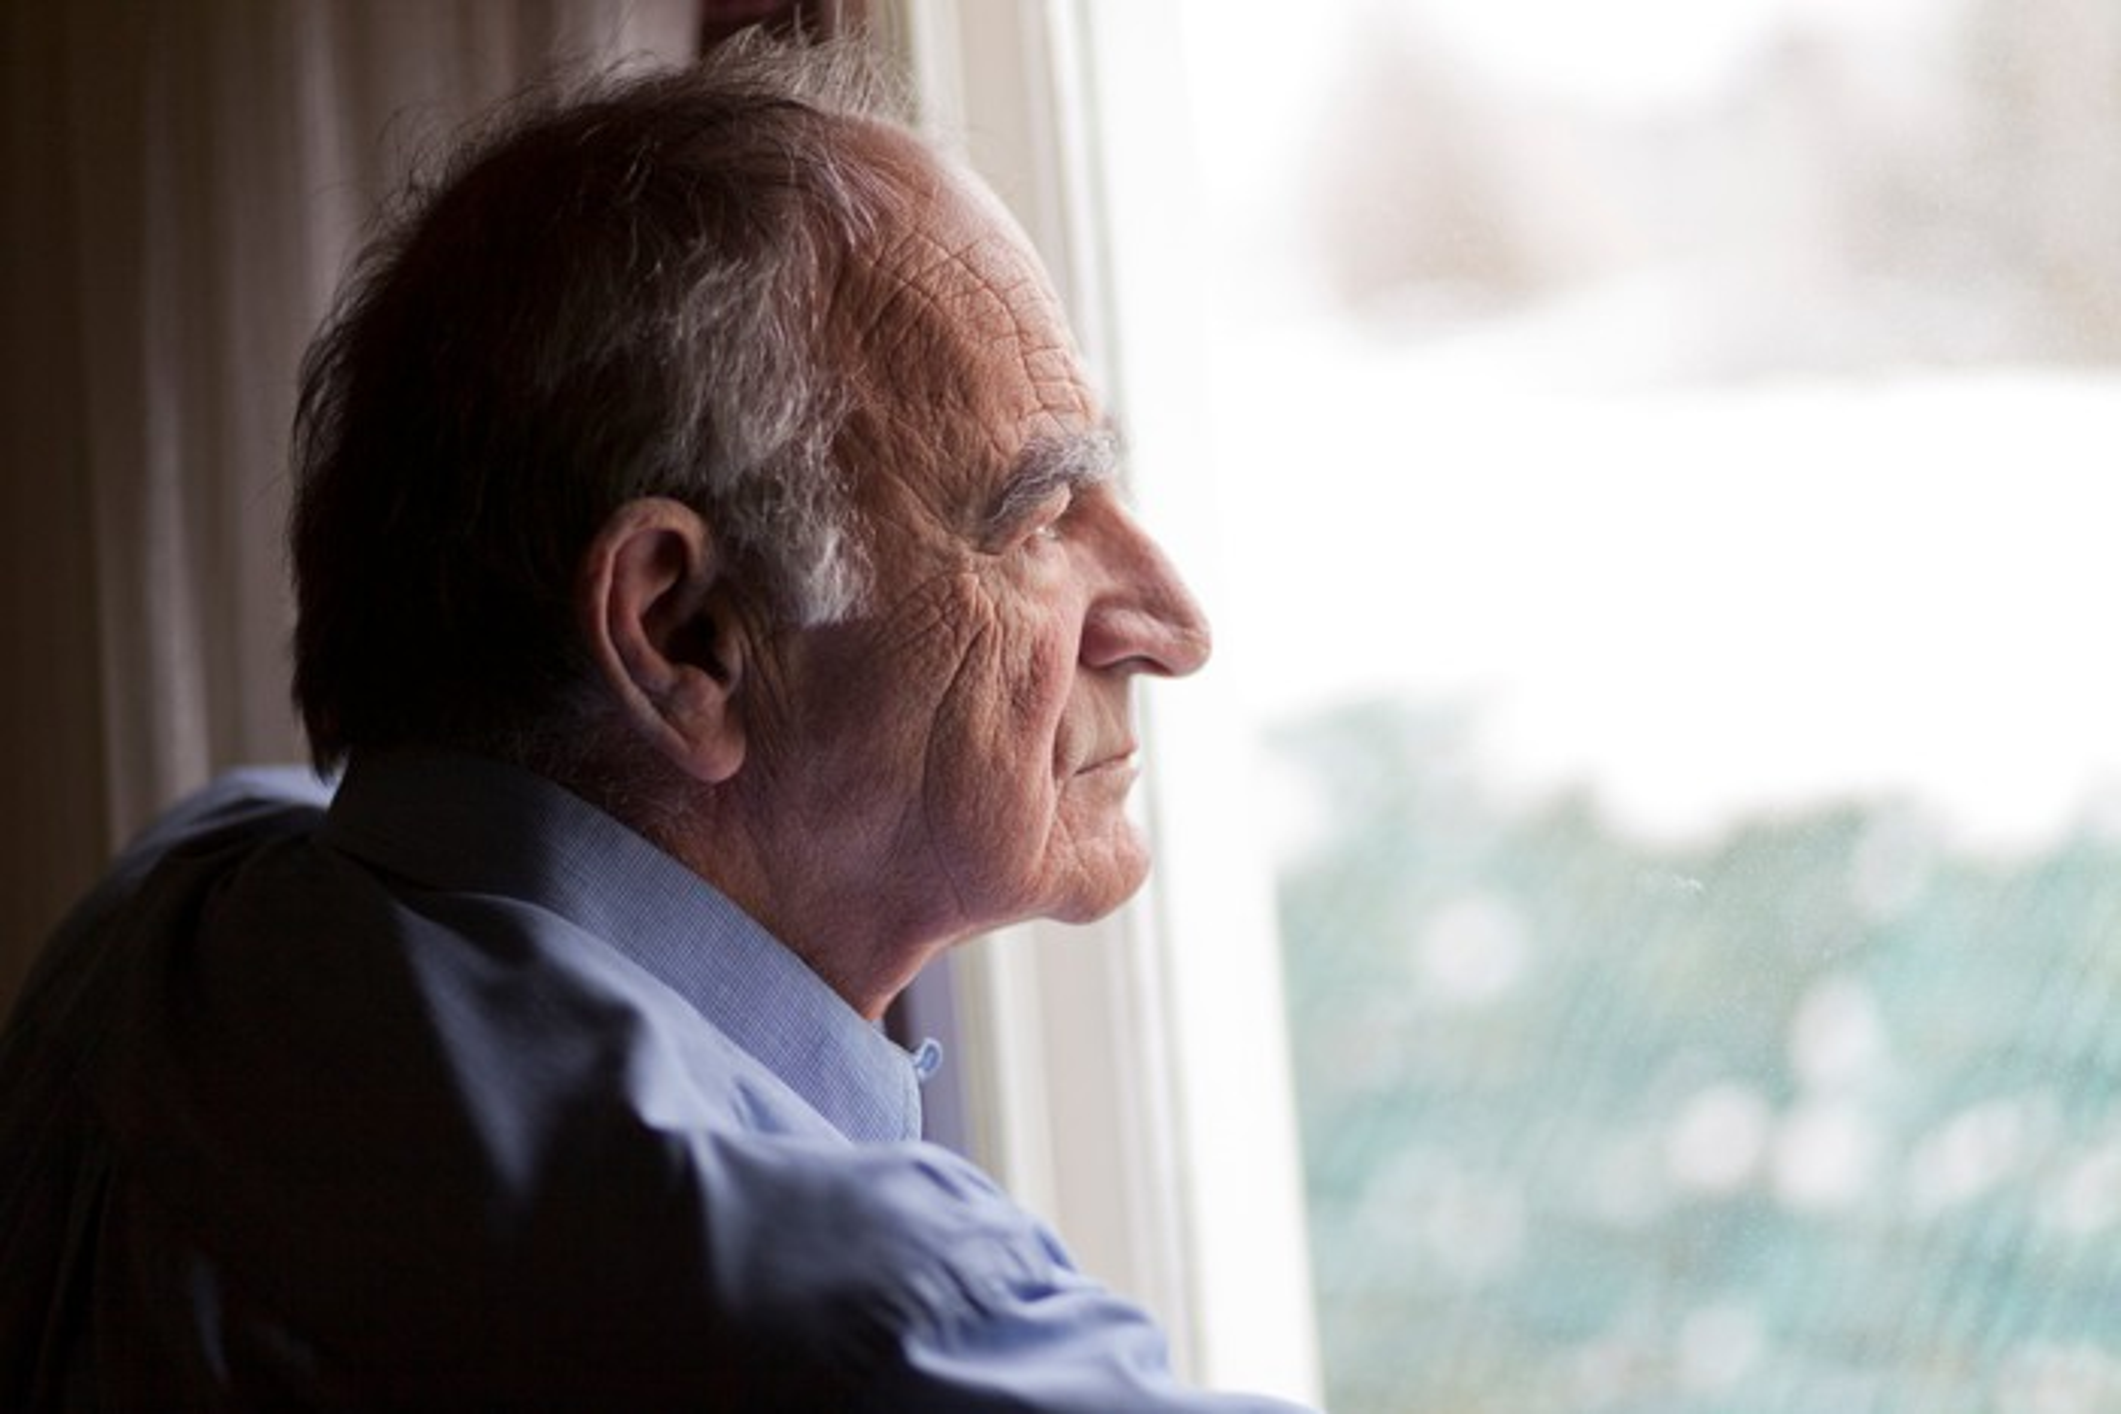 Sad senior man looking out the window